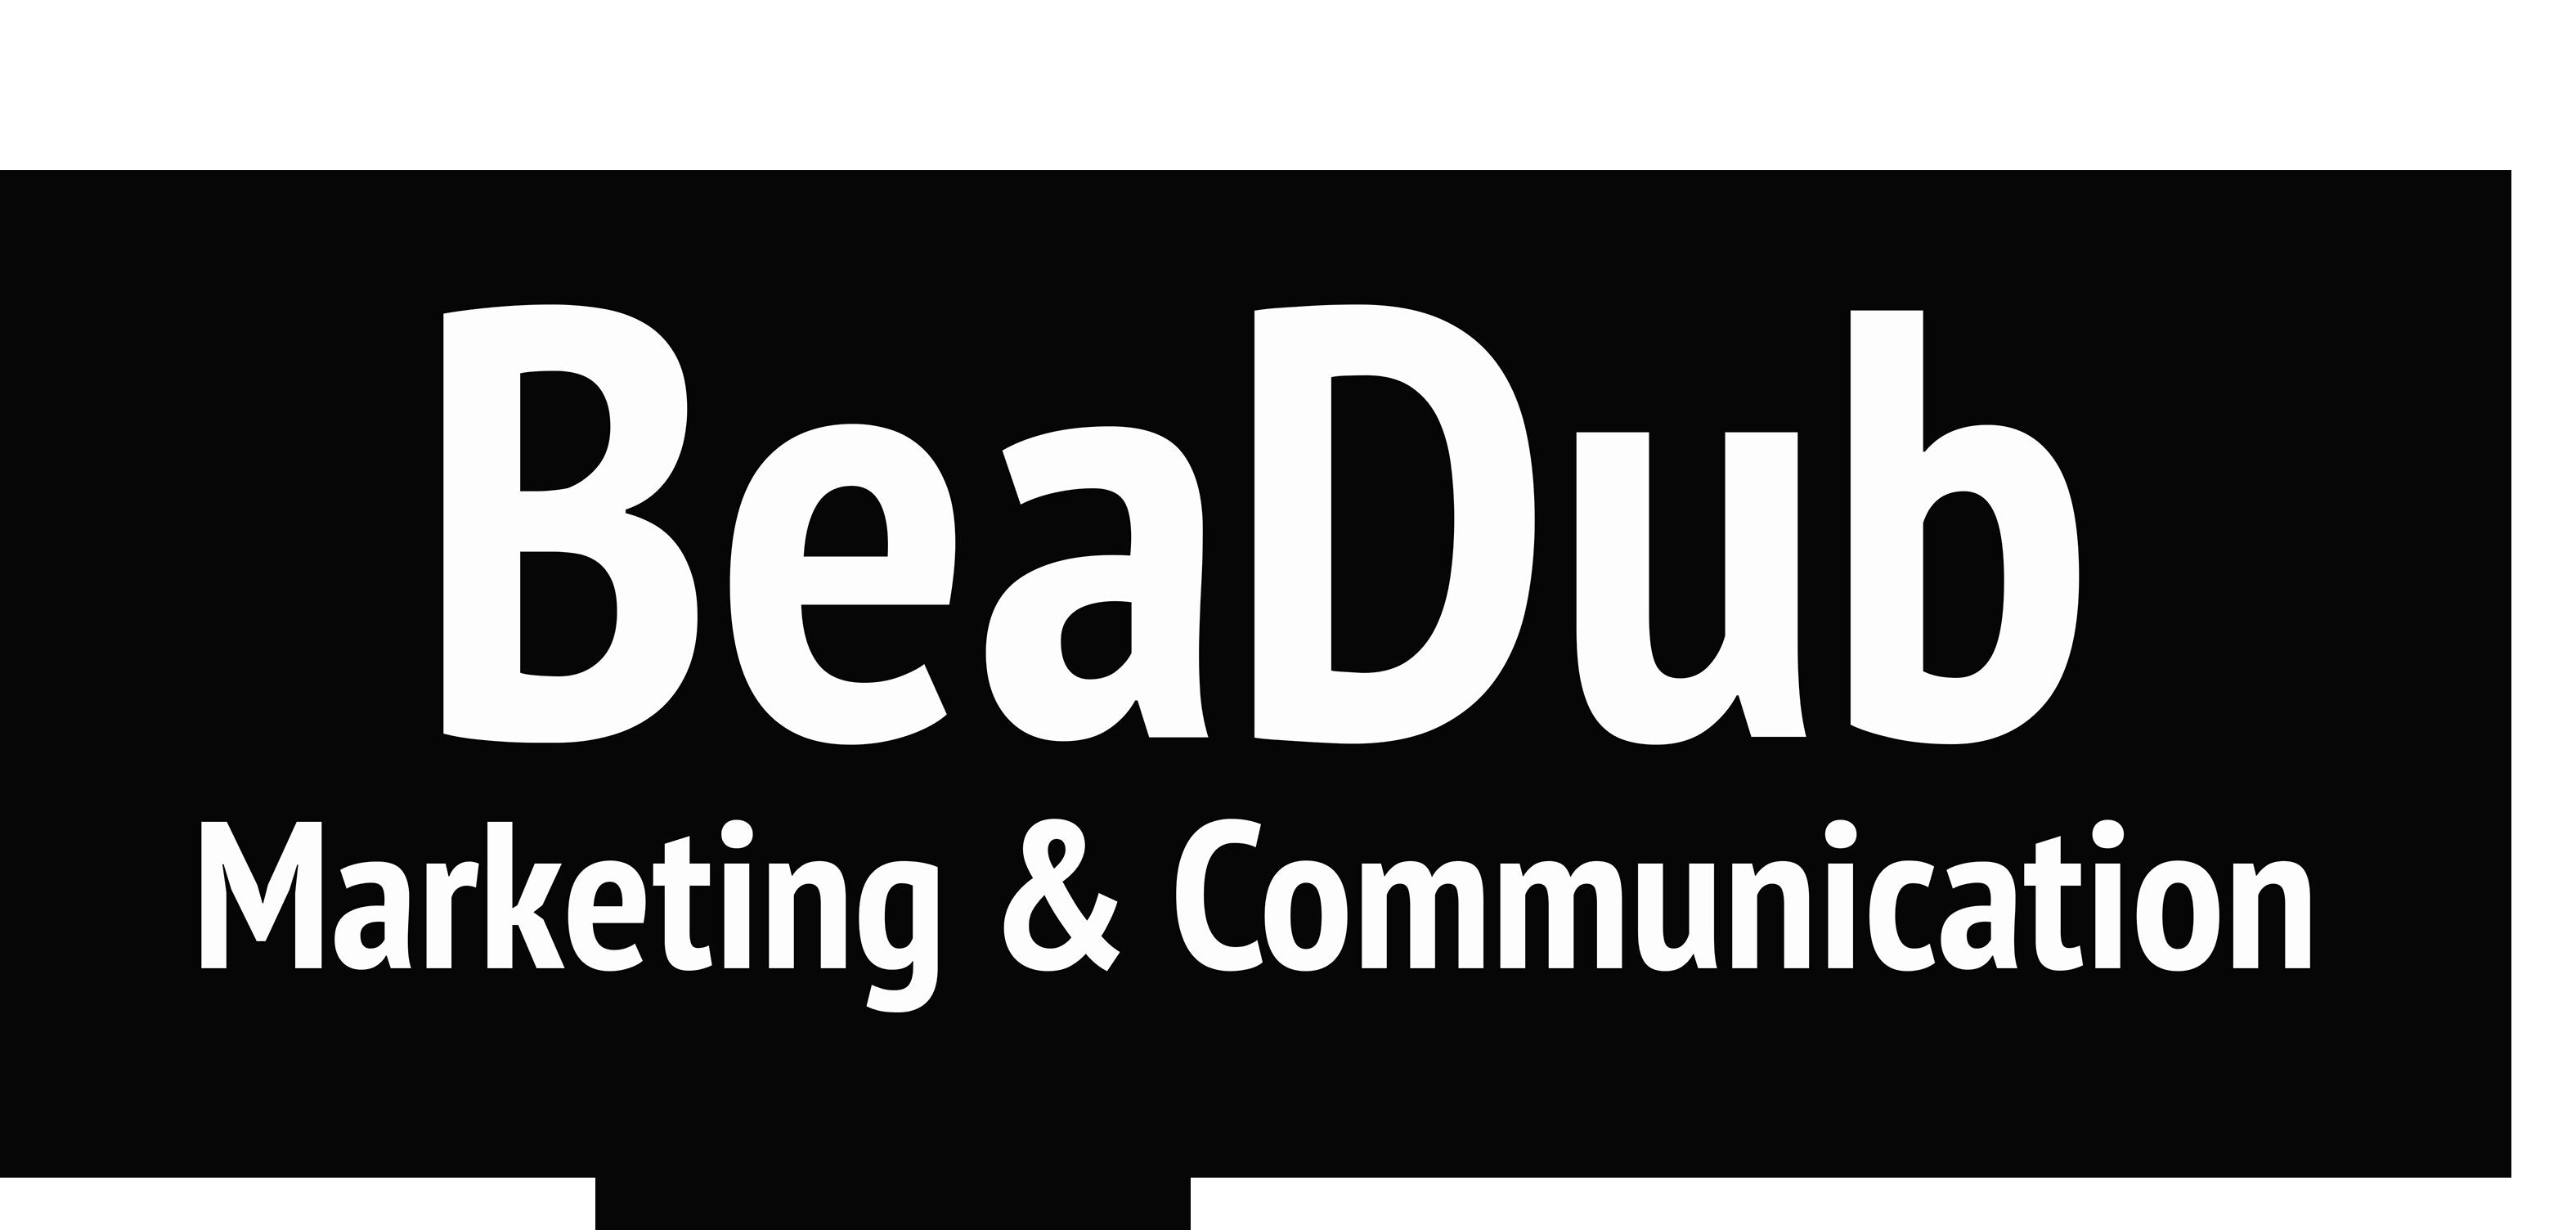 beadub.com